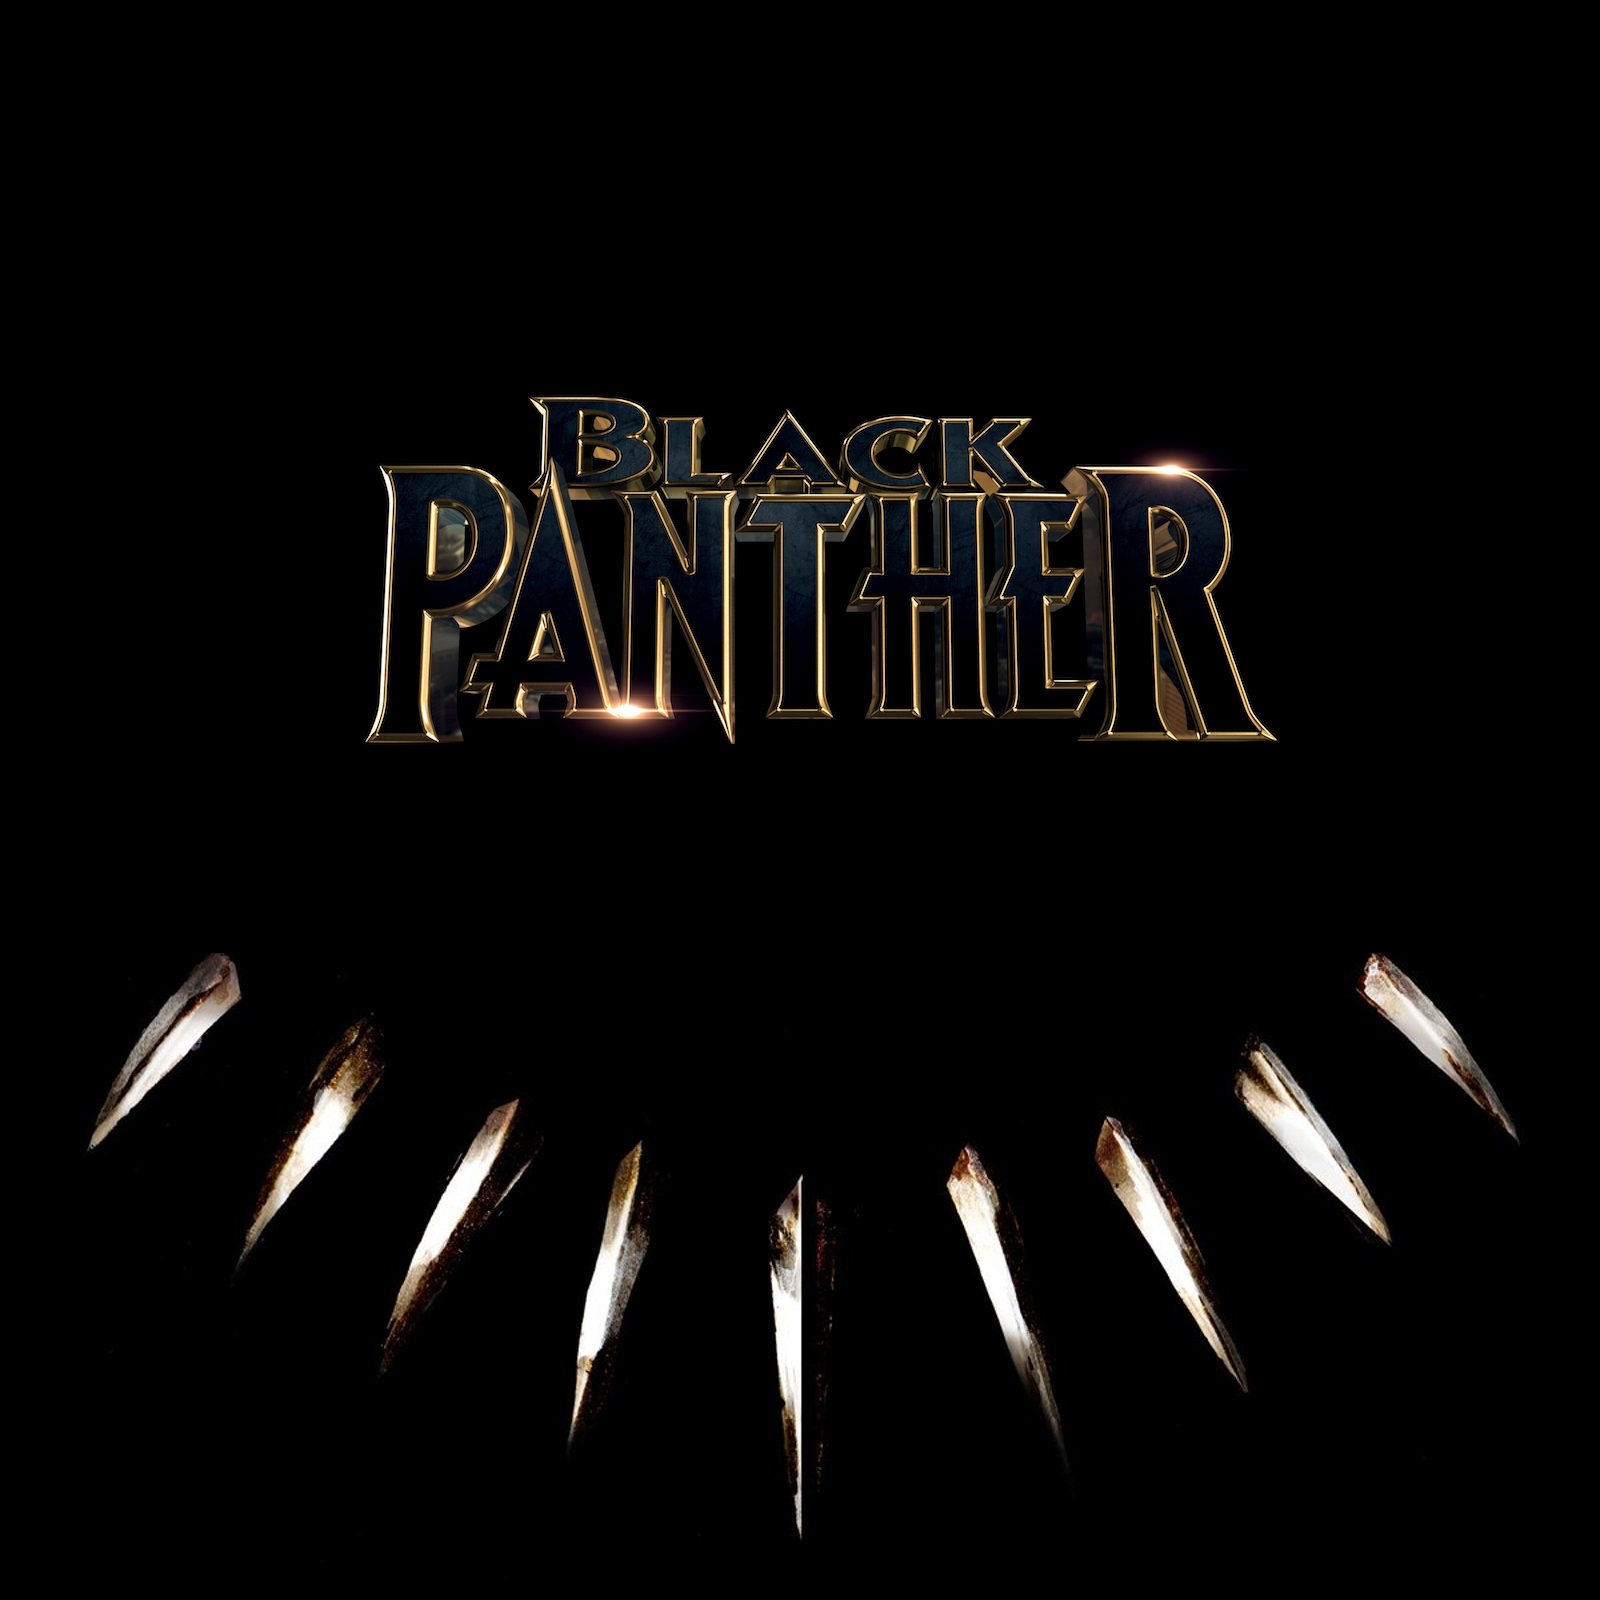 The Black Panther Original Score